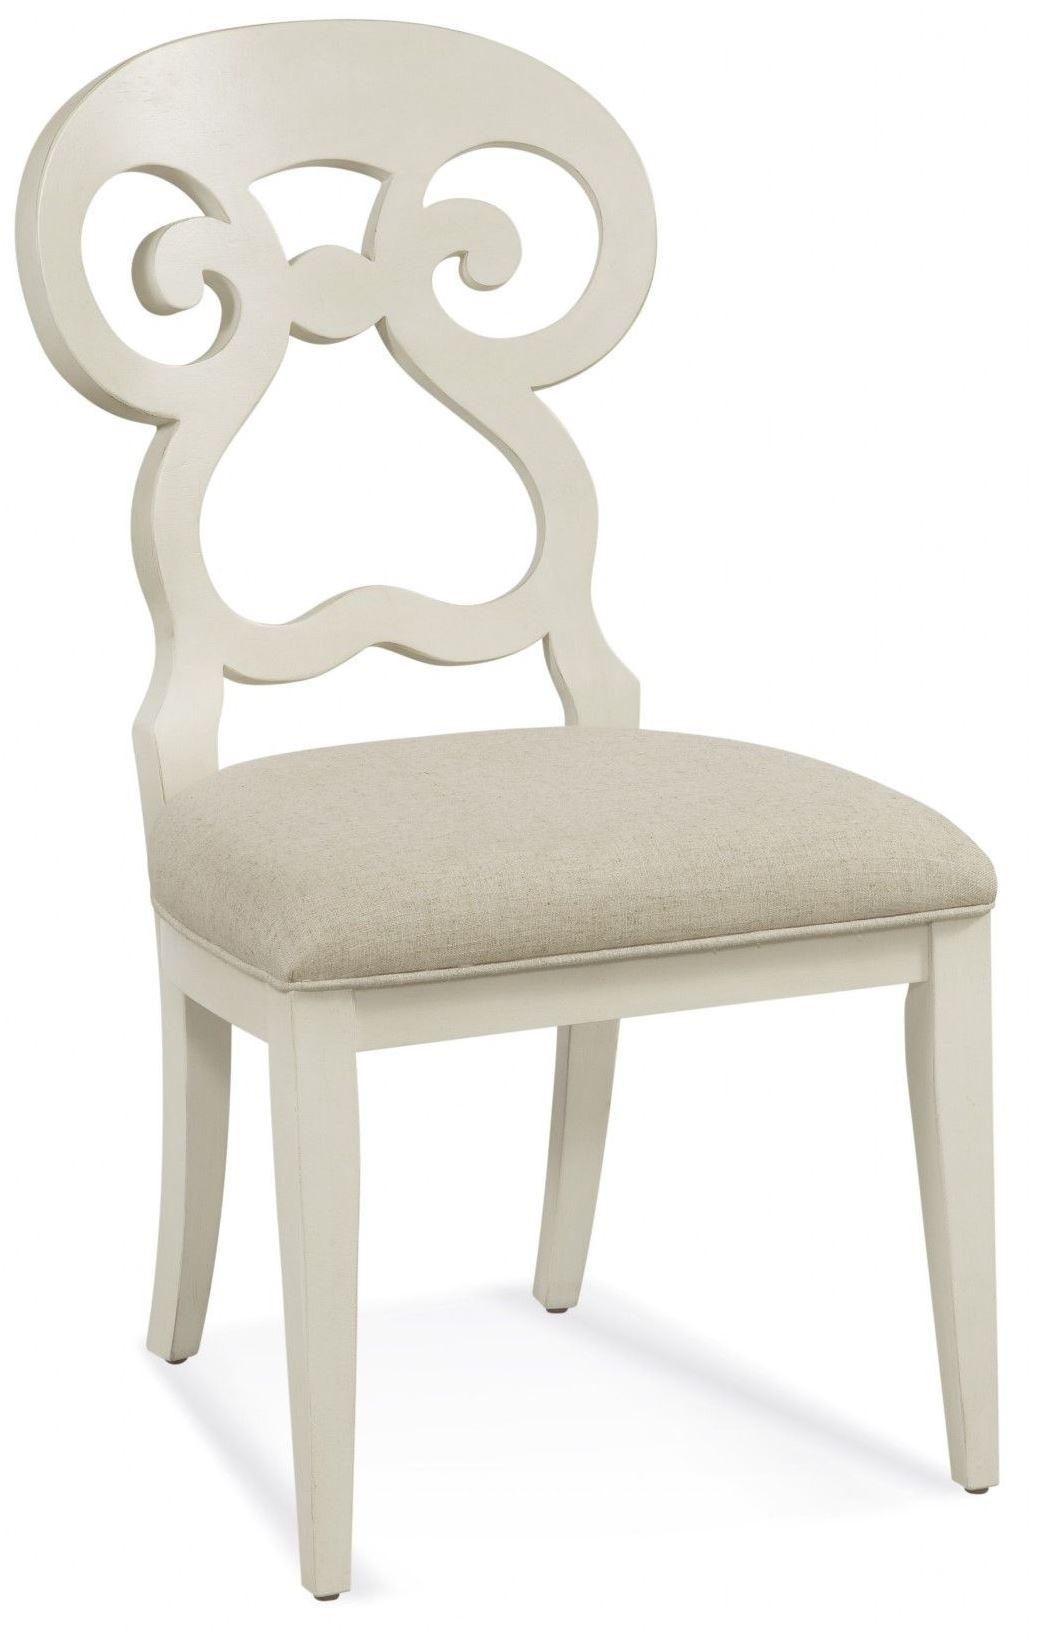 Avery White Parson Chair from Bassett Mirror  Coleman